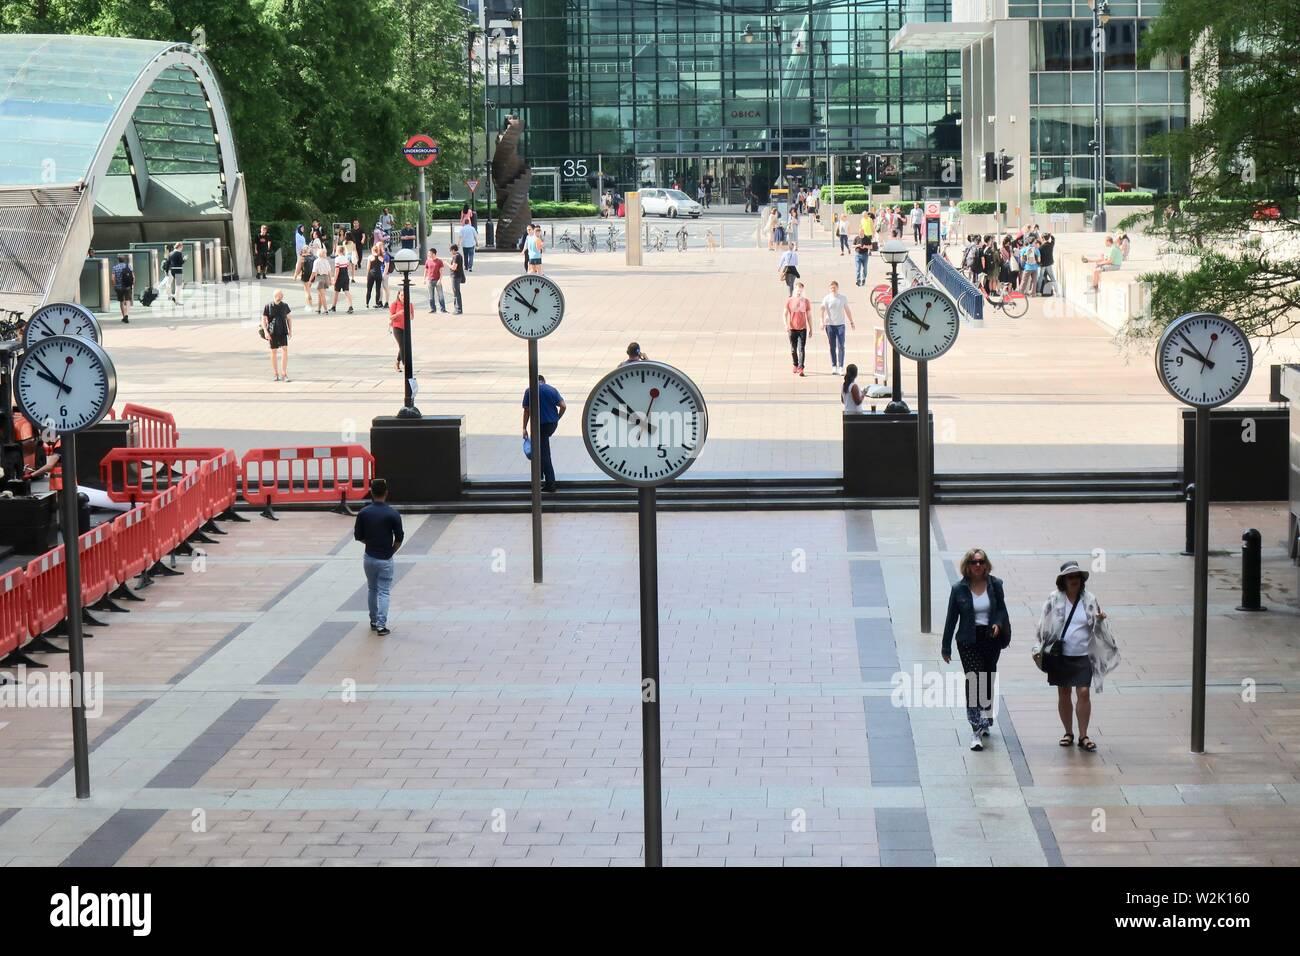 London UK, July 2019: Reuters Plaza, Canary Wharf, 10am Saturday morning. Stock Photo